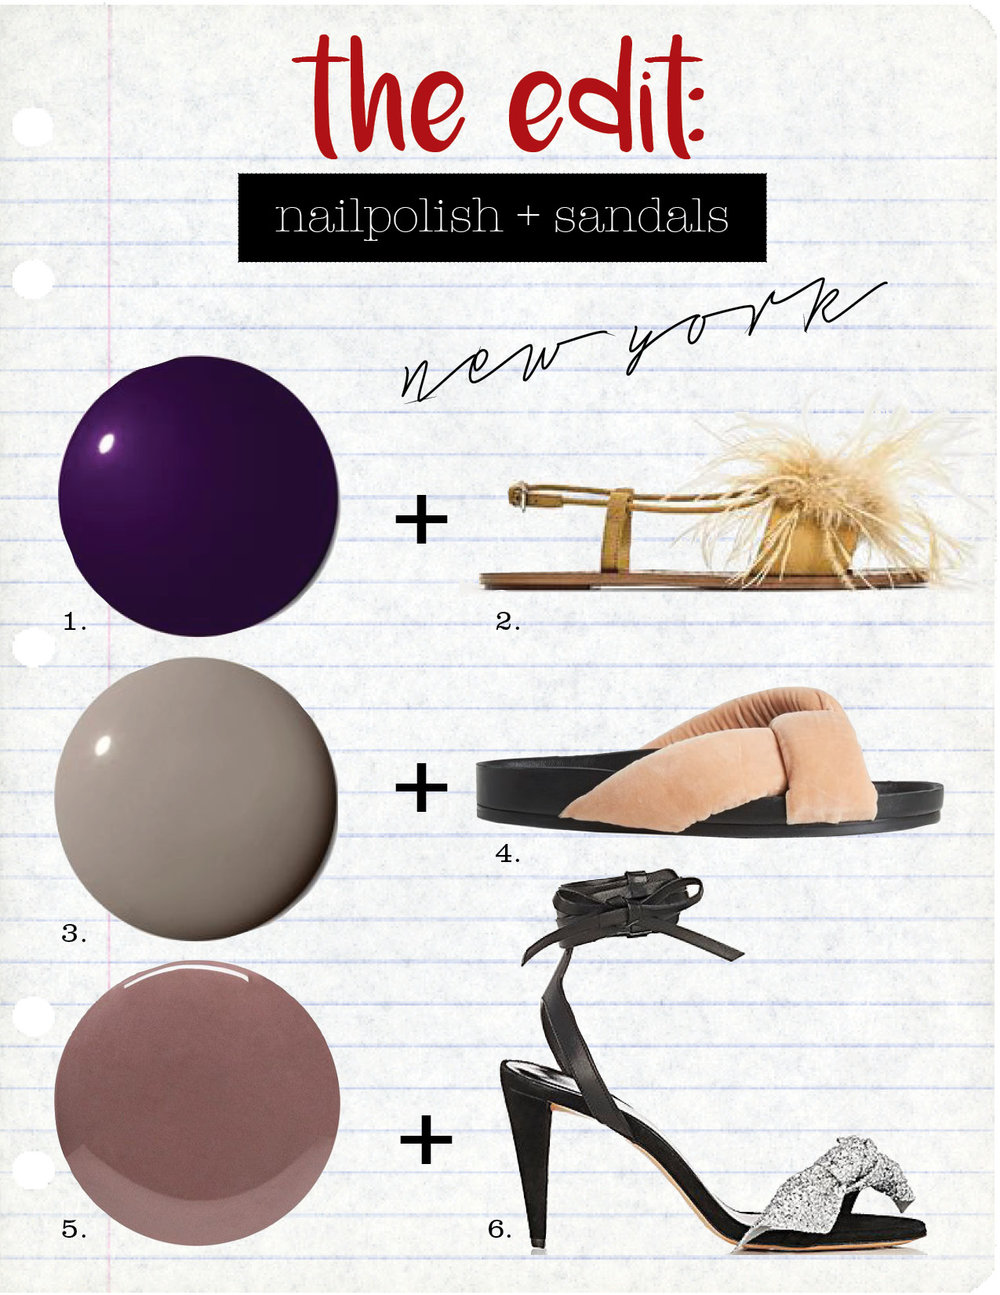 1. chanel le vernis longwear nail color in roubachka, $28,  violetgrey.com  2. zara flat sandals with feathers, $49,  zara.com  3. chanel le vernis longwear nail colour in garconne, $28,  violetgrey.com  4. chloe nolan velvet slides, $555,  matchesfashion.com  5. tom ford beauty nail polish in black sugar, $35,  net-a-porter.com  6. isabel marant akynn suede & leather sandals, $620,  barneys.com